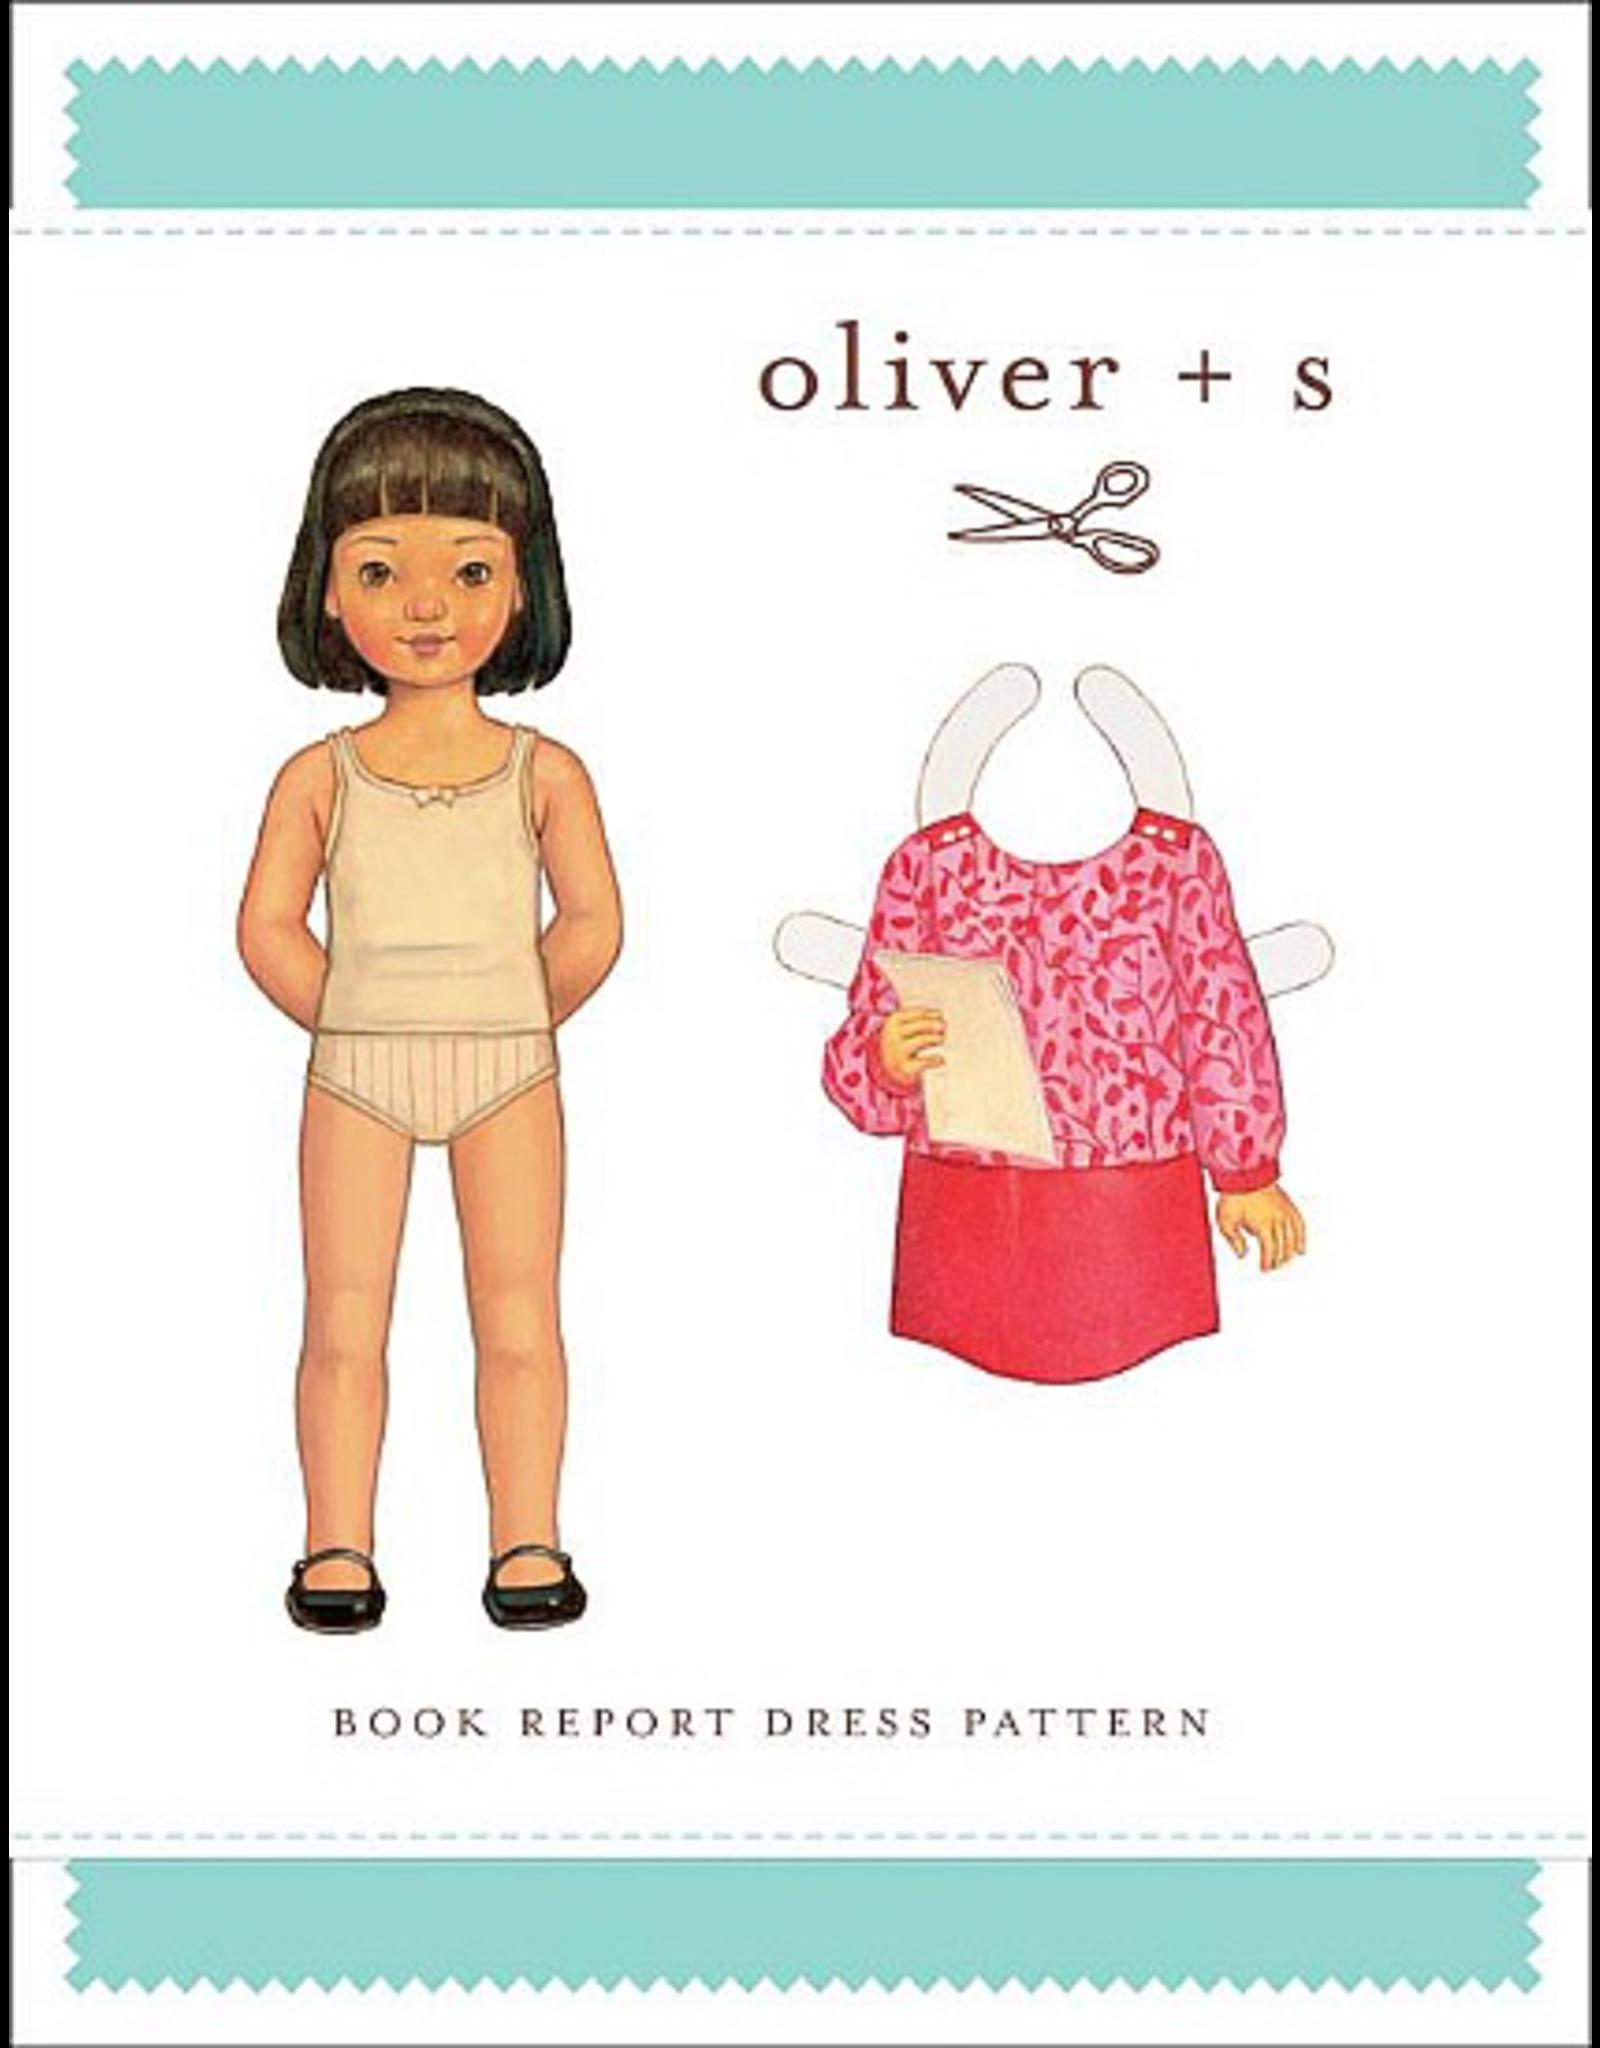 Oliver + S Oliver+S's Book Report Dress Pattern - Size 5 - 12